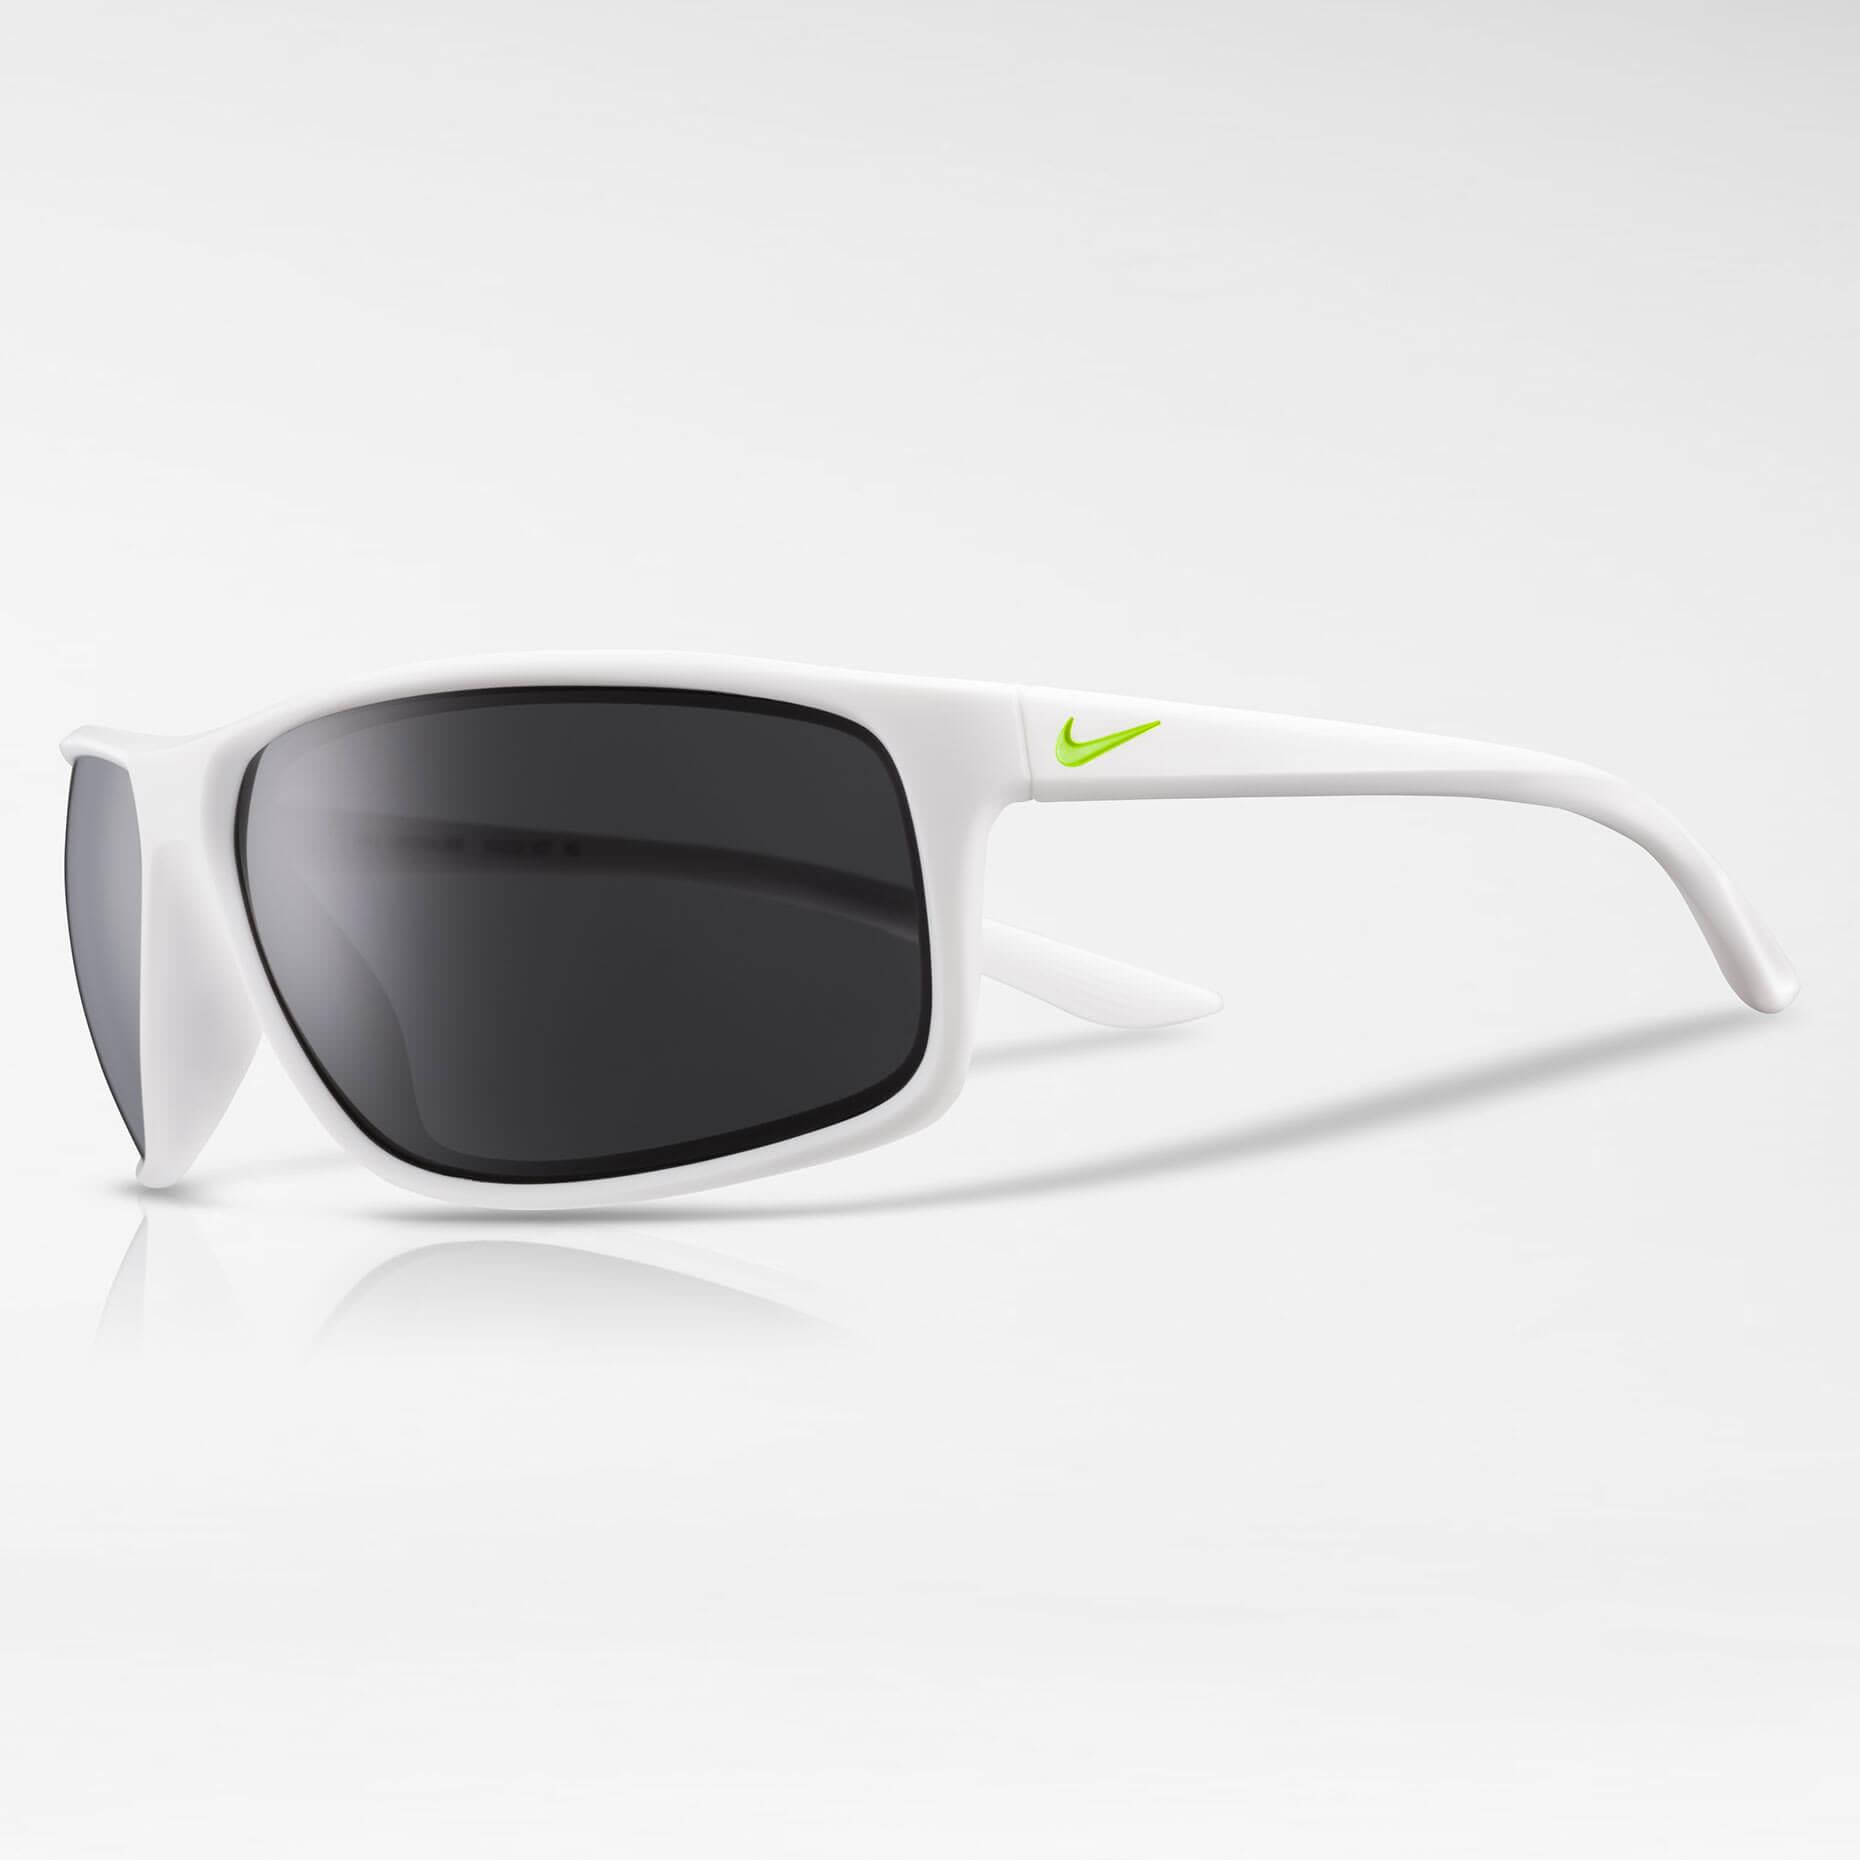 Nike Adrenaline Black White